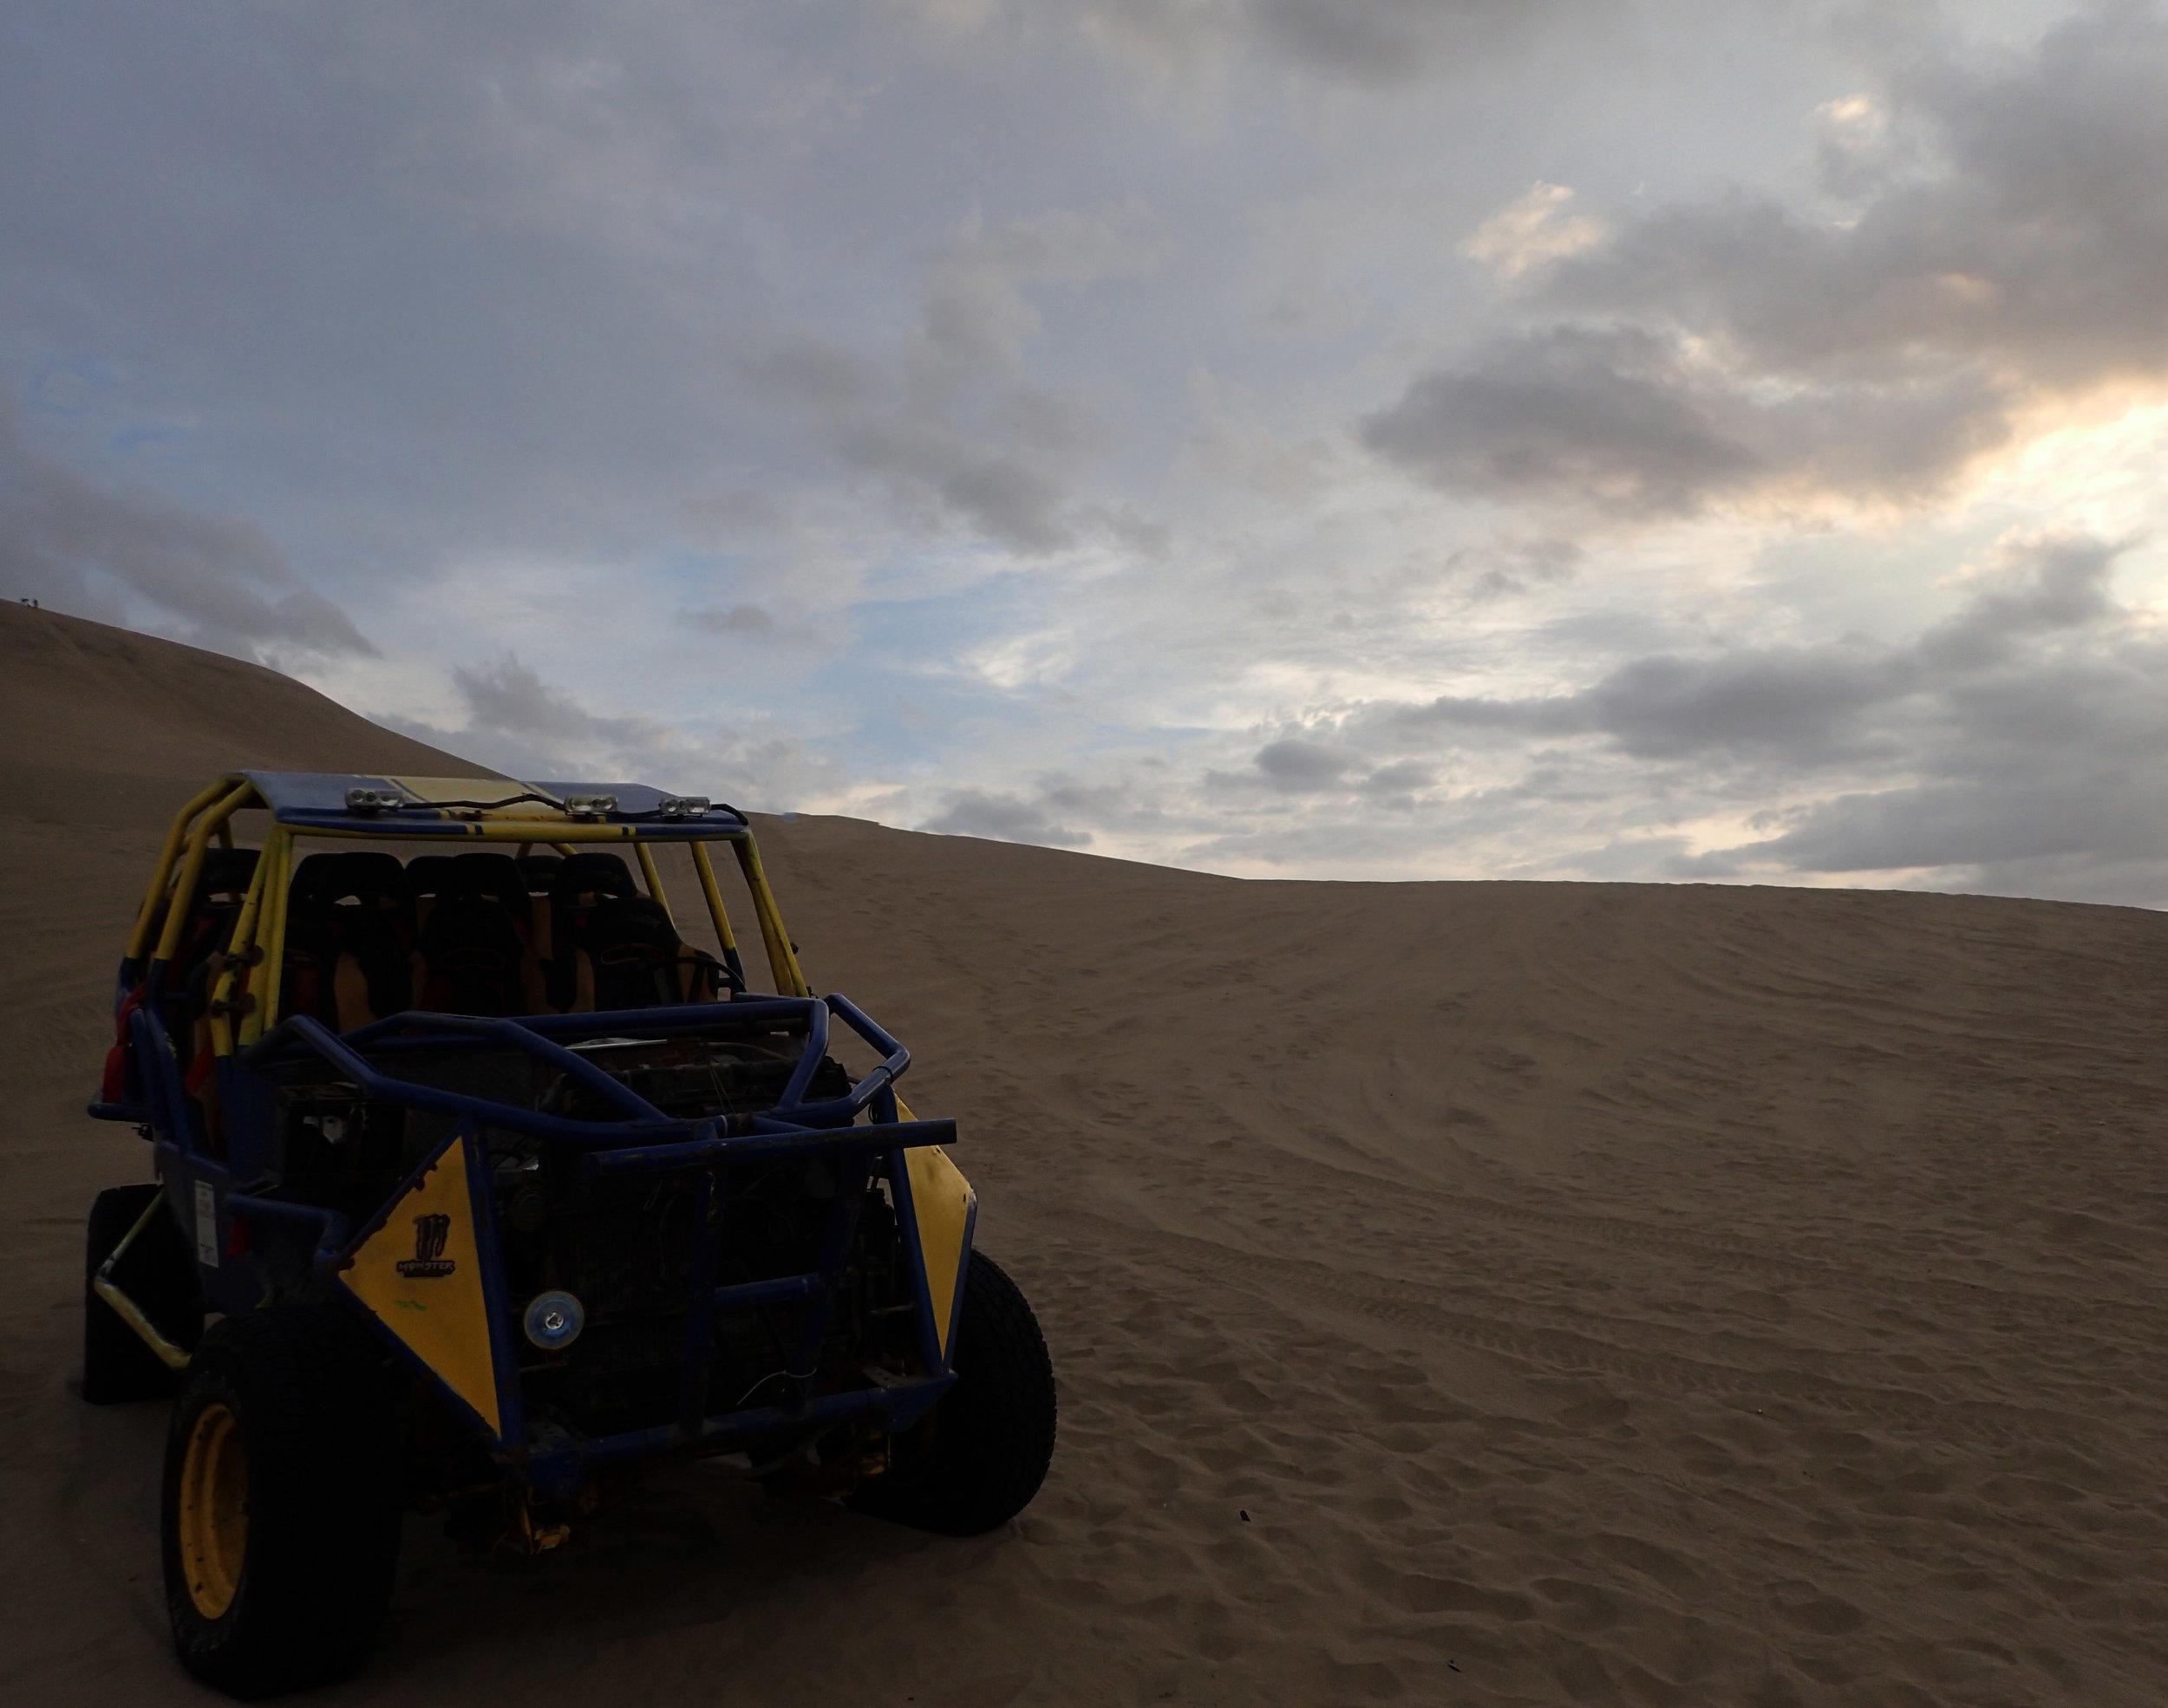 dune buggy 2.jpg